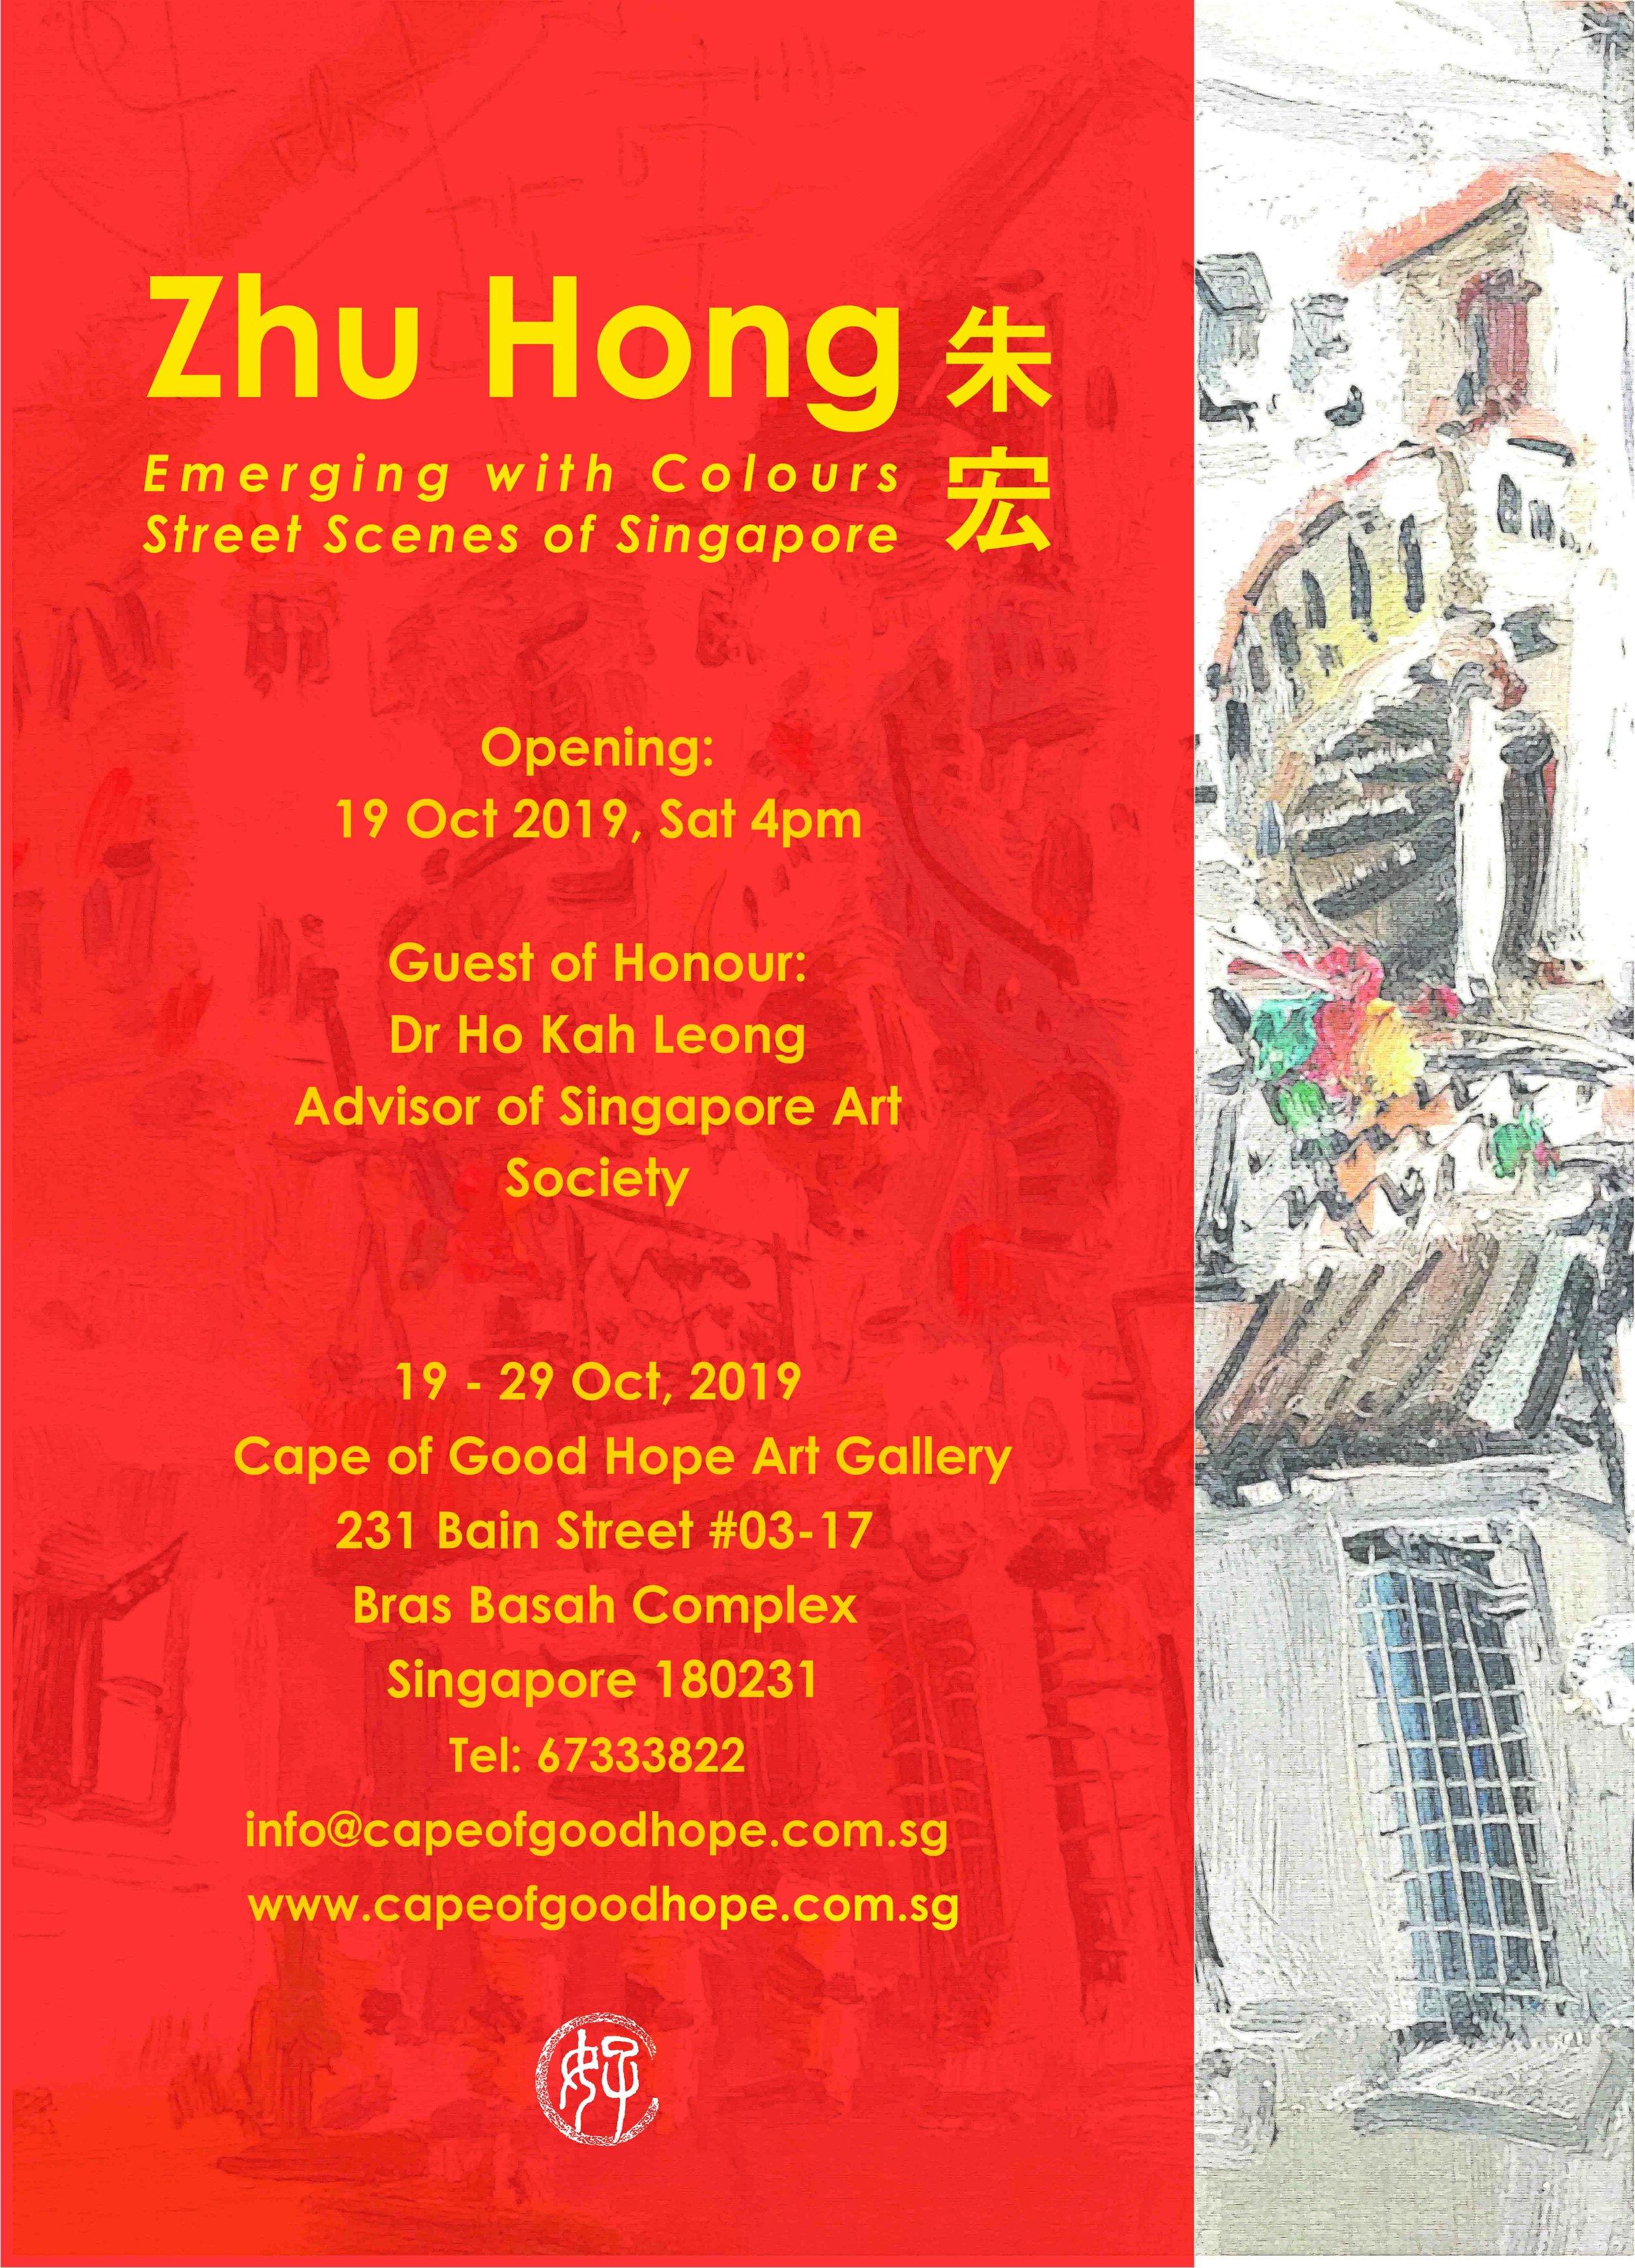 zhu hong poster.jpg